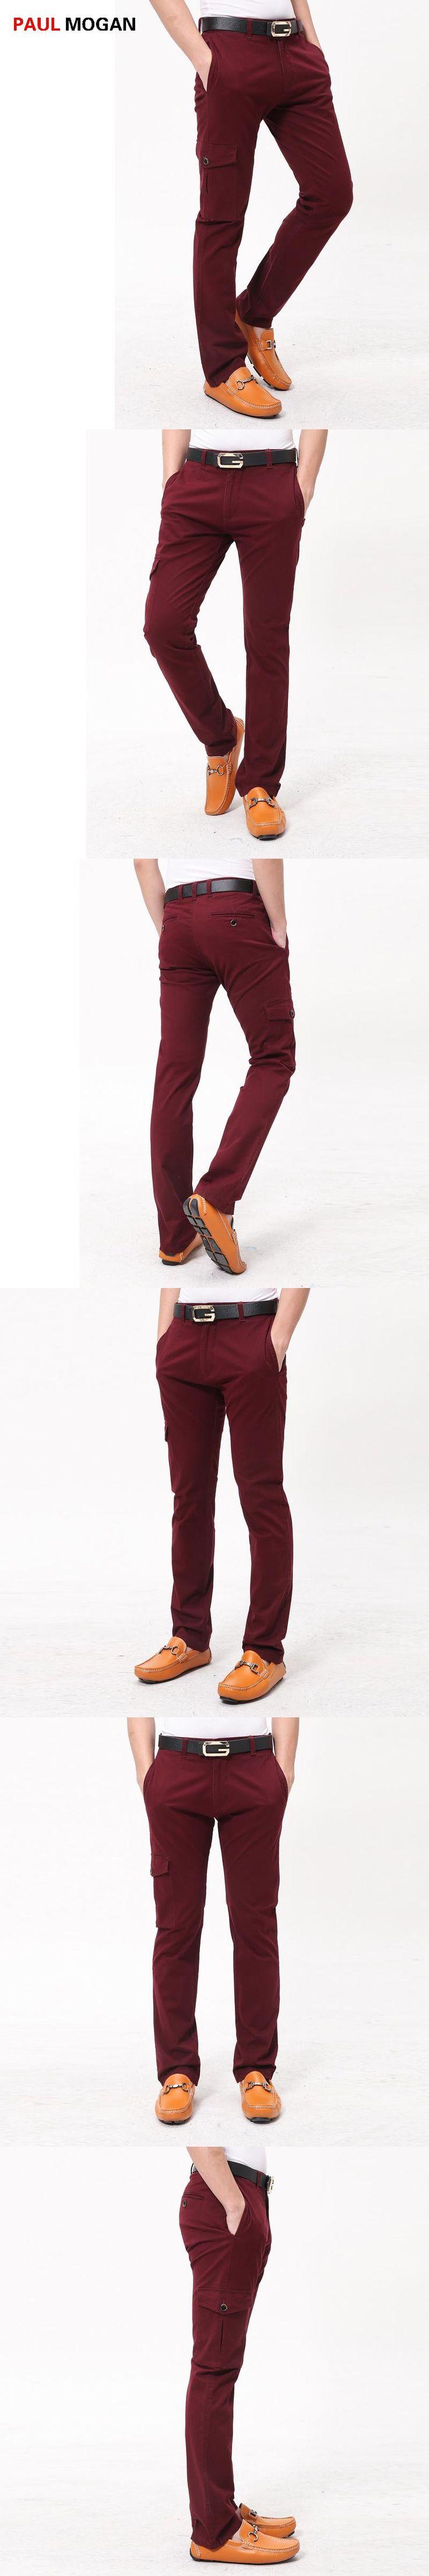 Paul Mogan 2017 men pants fashion Casual cotton wine red pants Designer brand high quality pocket design pants men casual pants